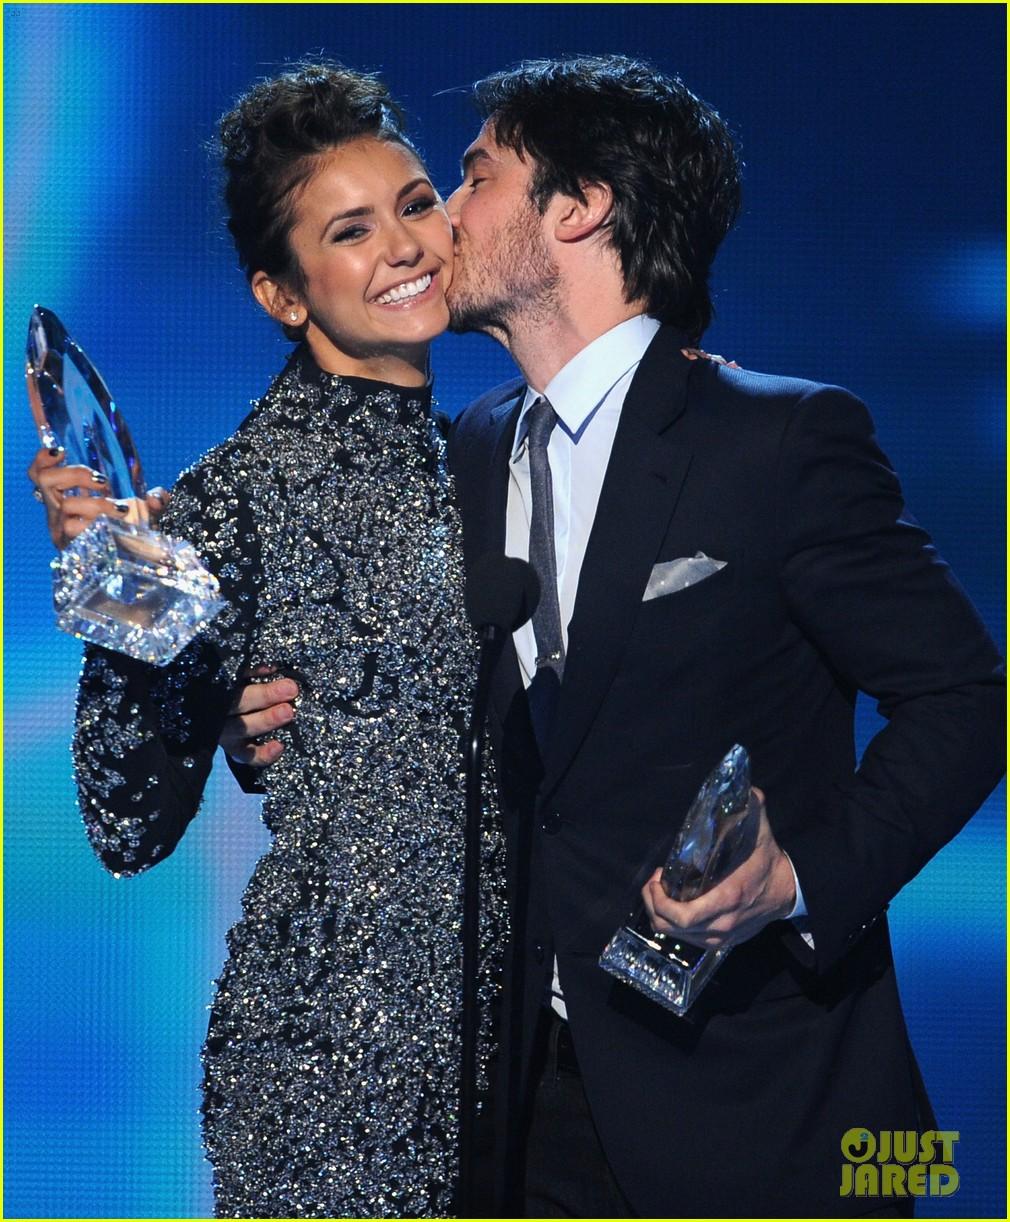 ian somerhalder nina dobrev joke about their breakup at peoples choice awards 143025755